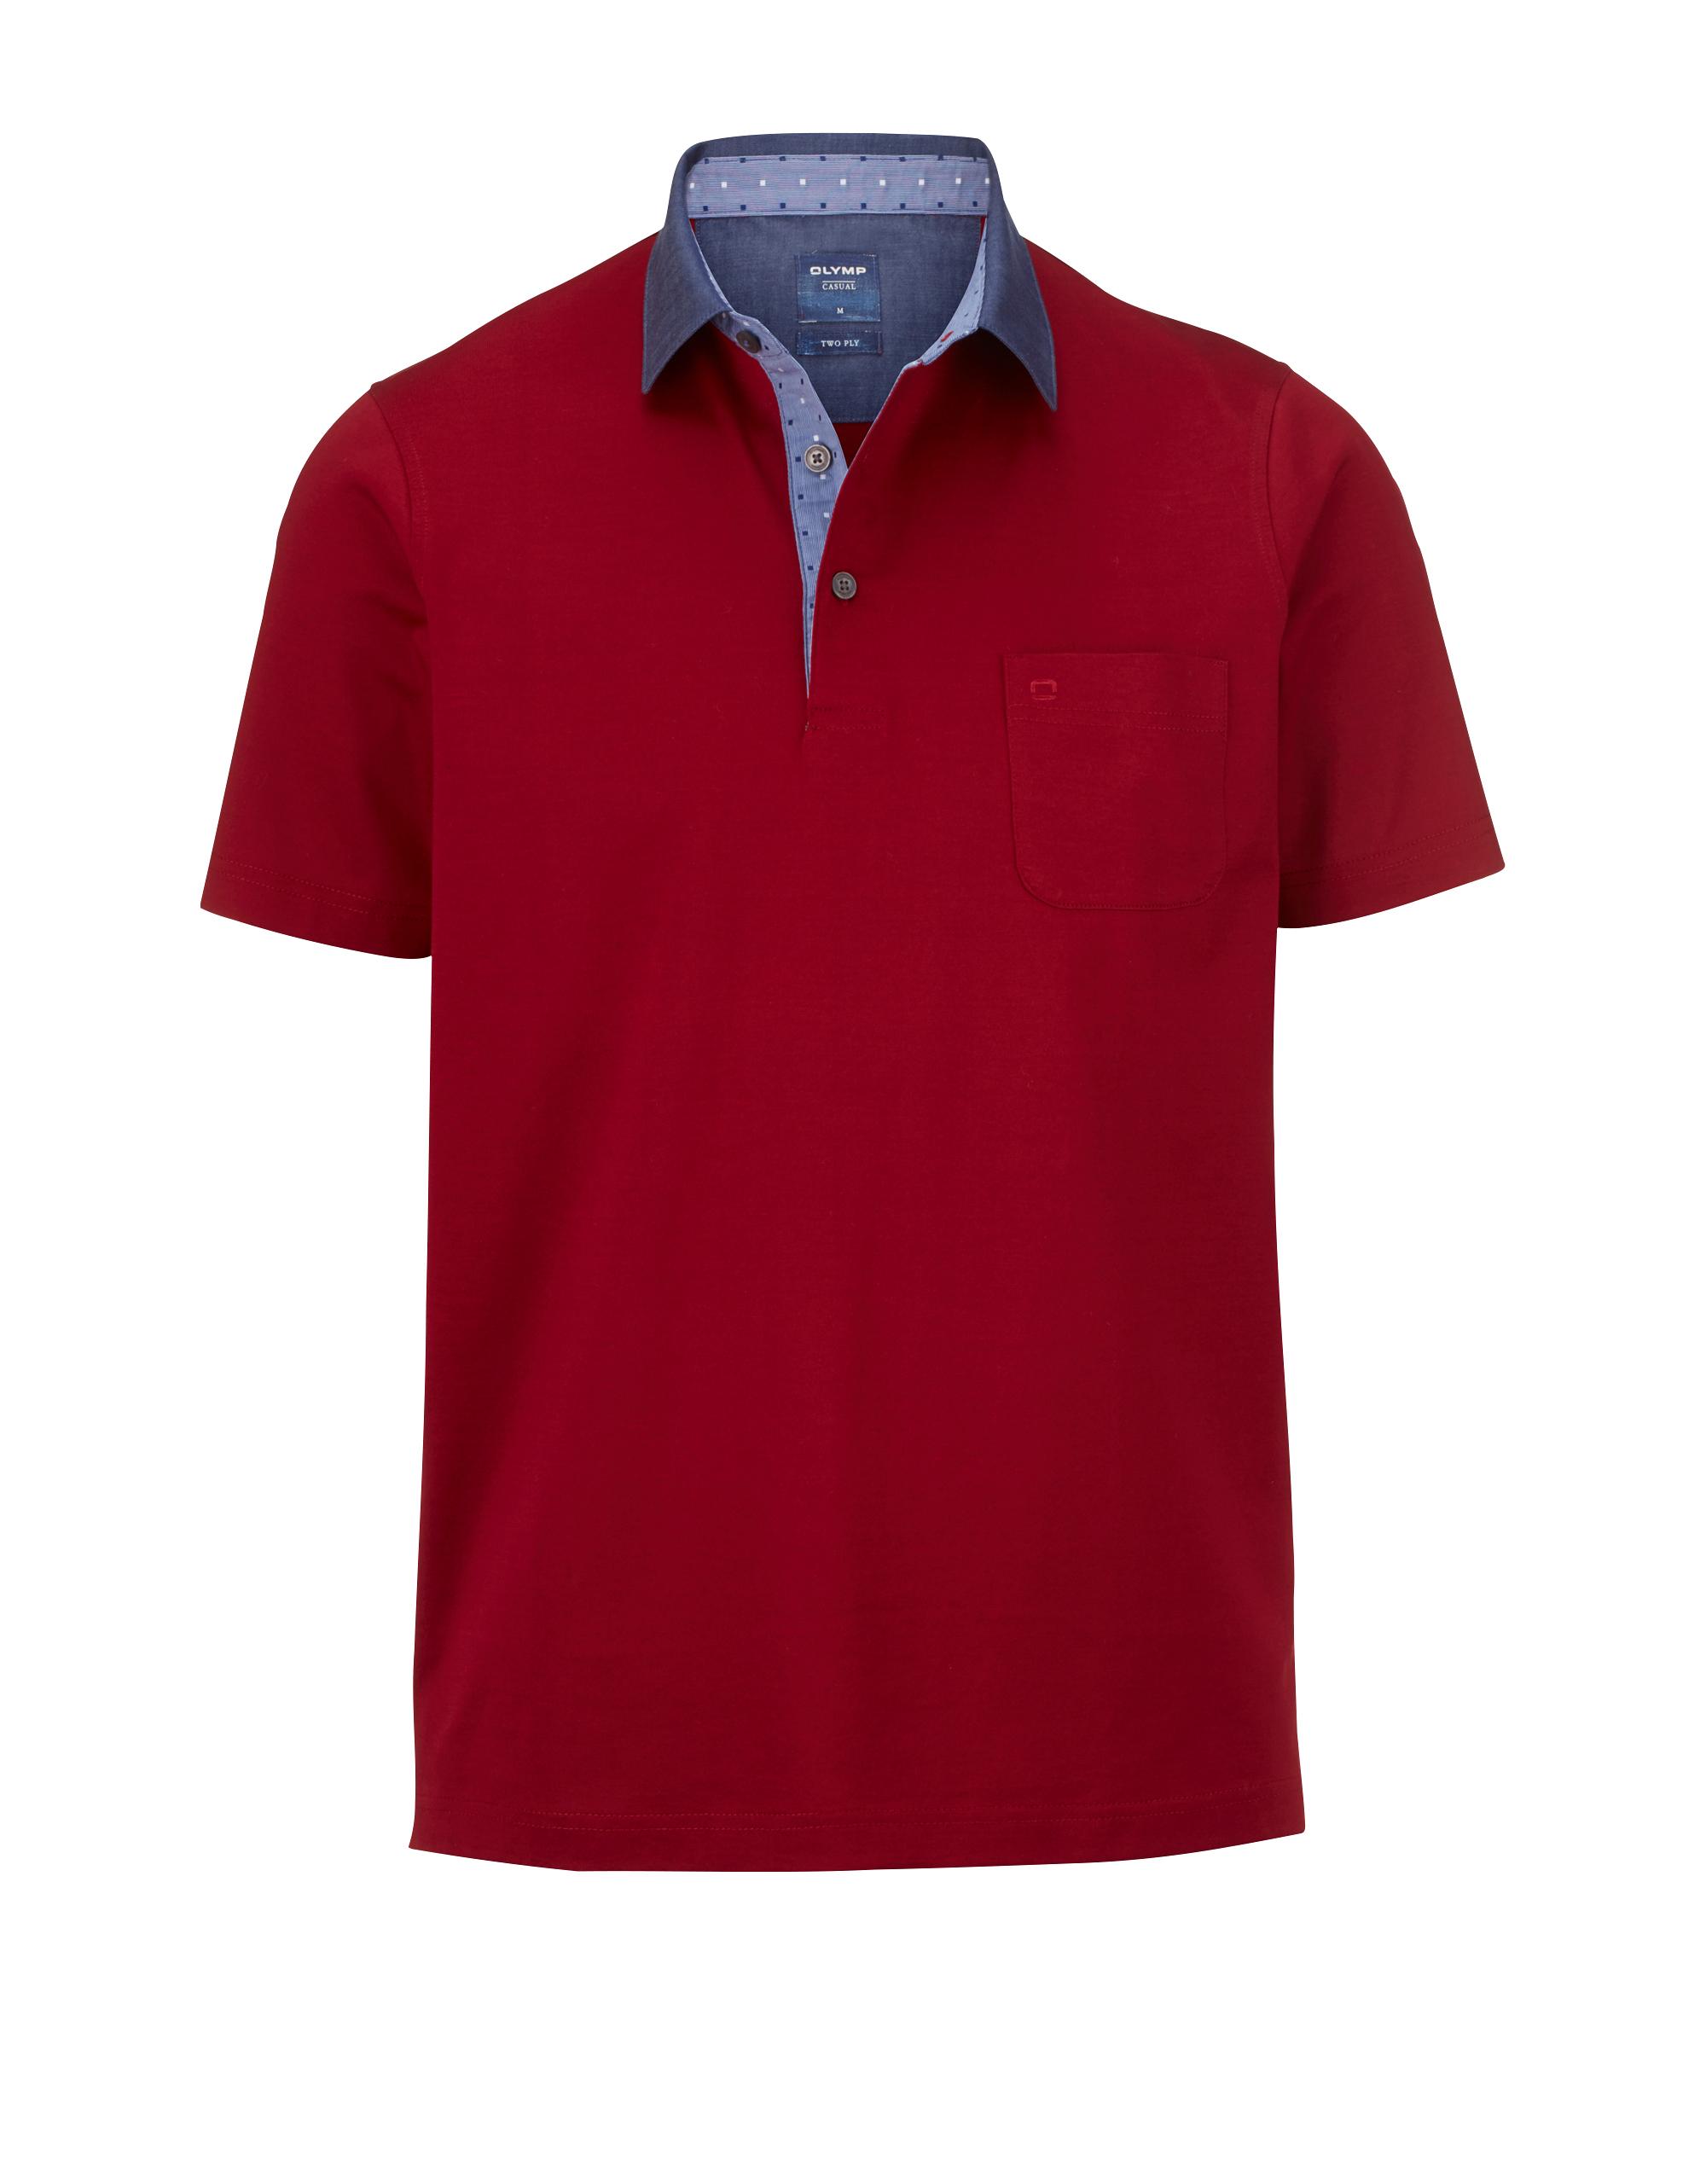 OLYMP Polo-shirt, modern fit, Dunkelrot, L | Bekleidung > Polo Shirts > Kurzarm | Dunkelrot | 100% baumwolle | OLYMP Polo